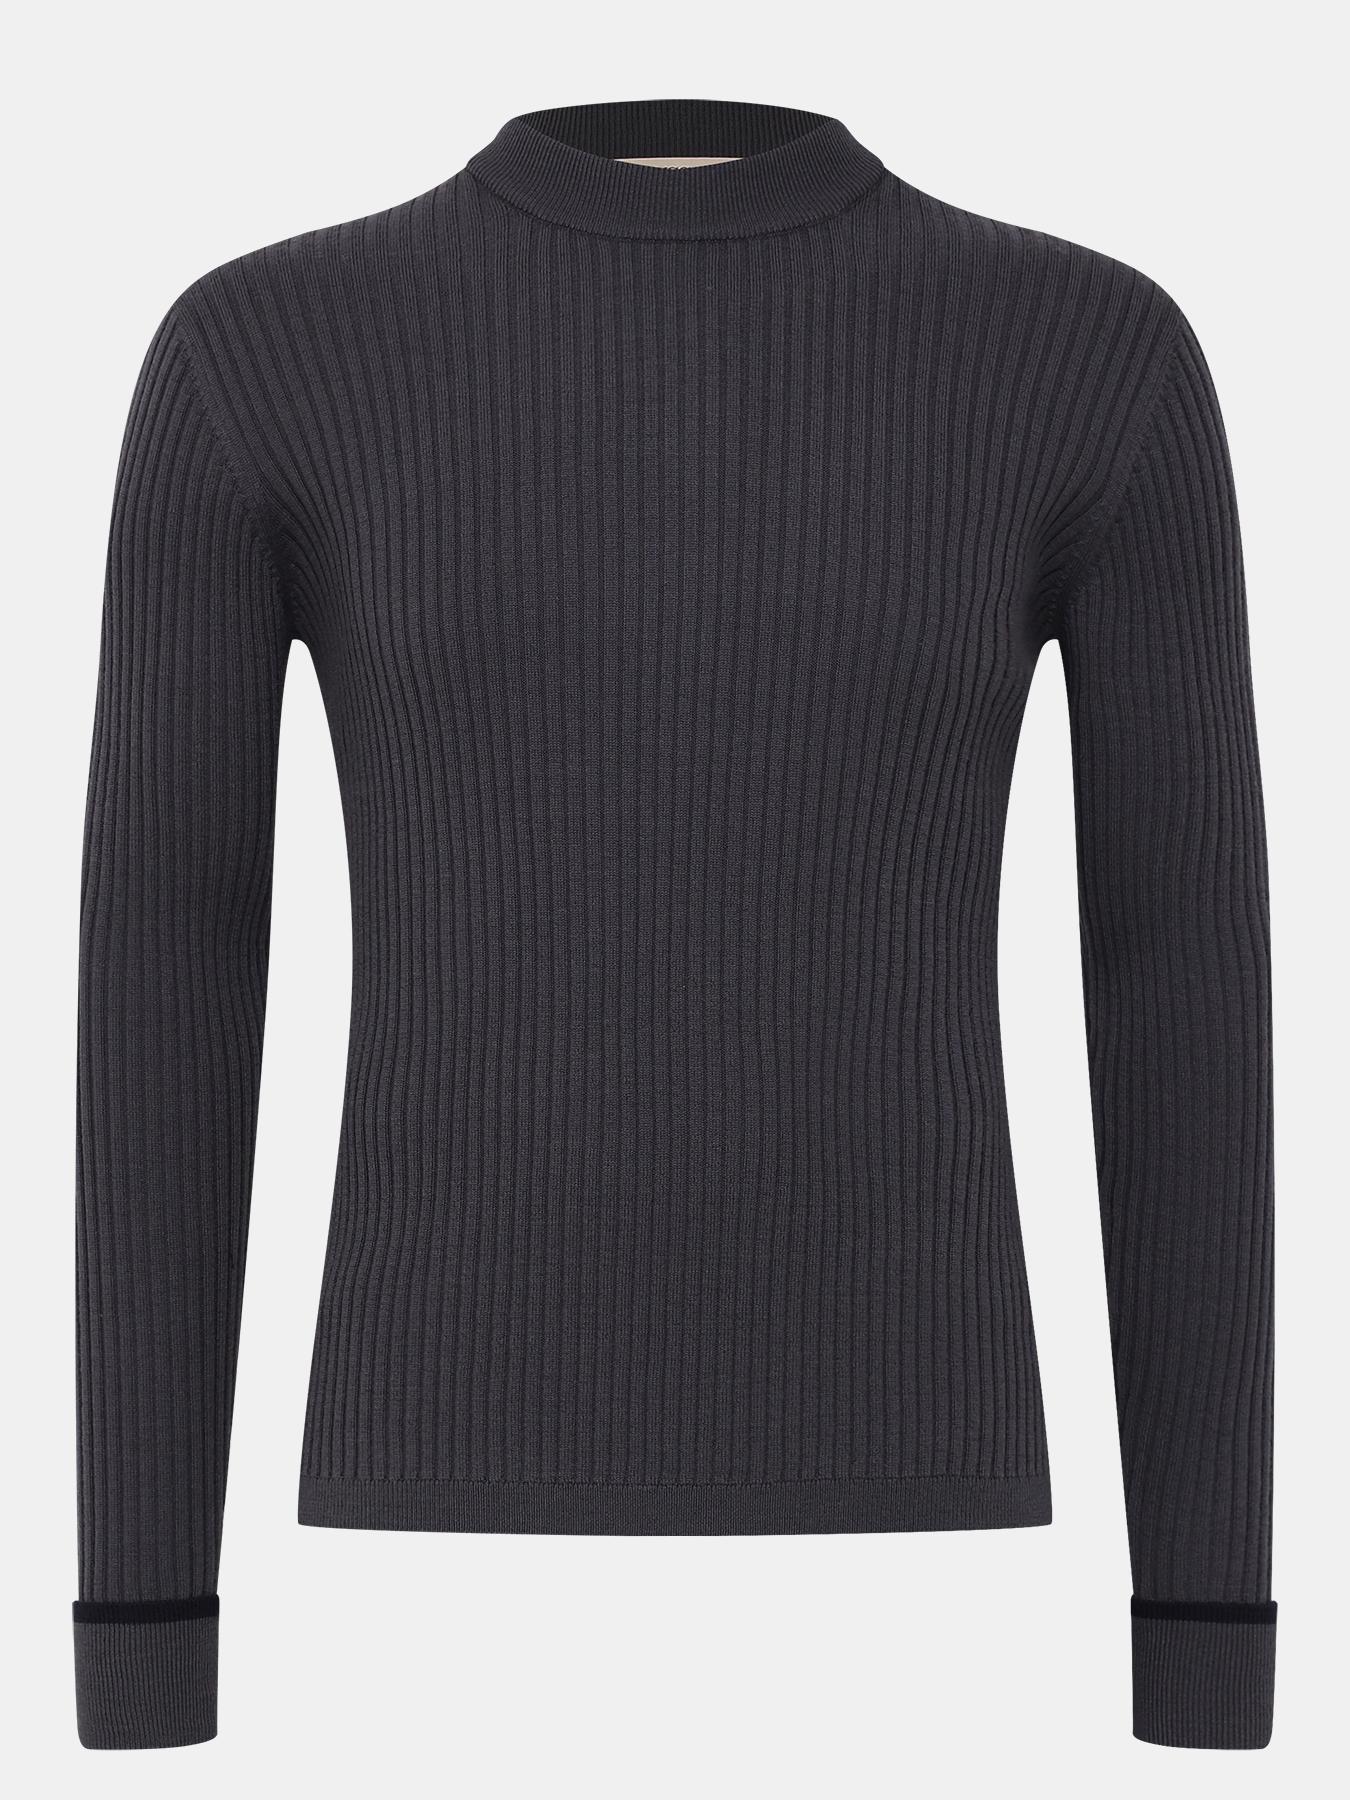 Джемперы Trussardi Джемпер джемпер trussardi jeans пуловер